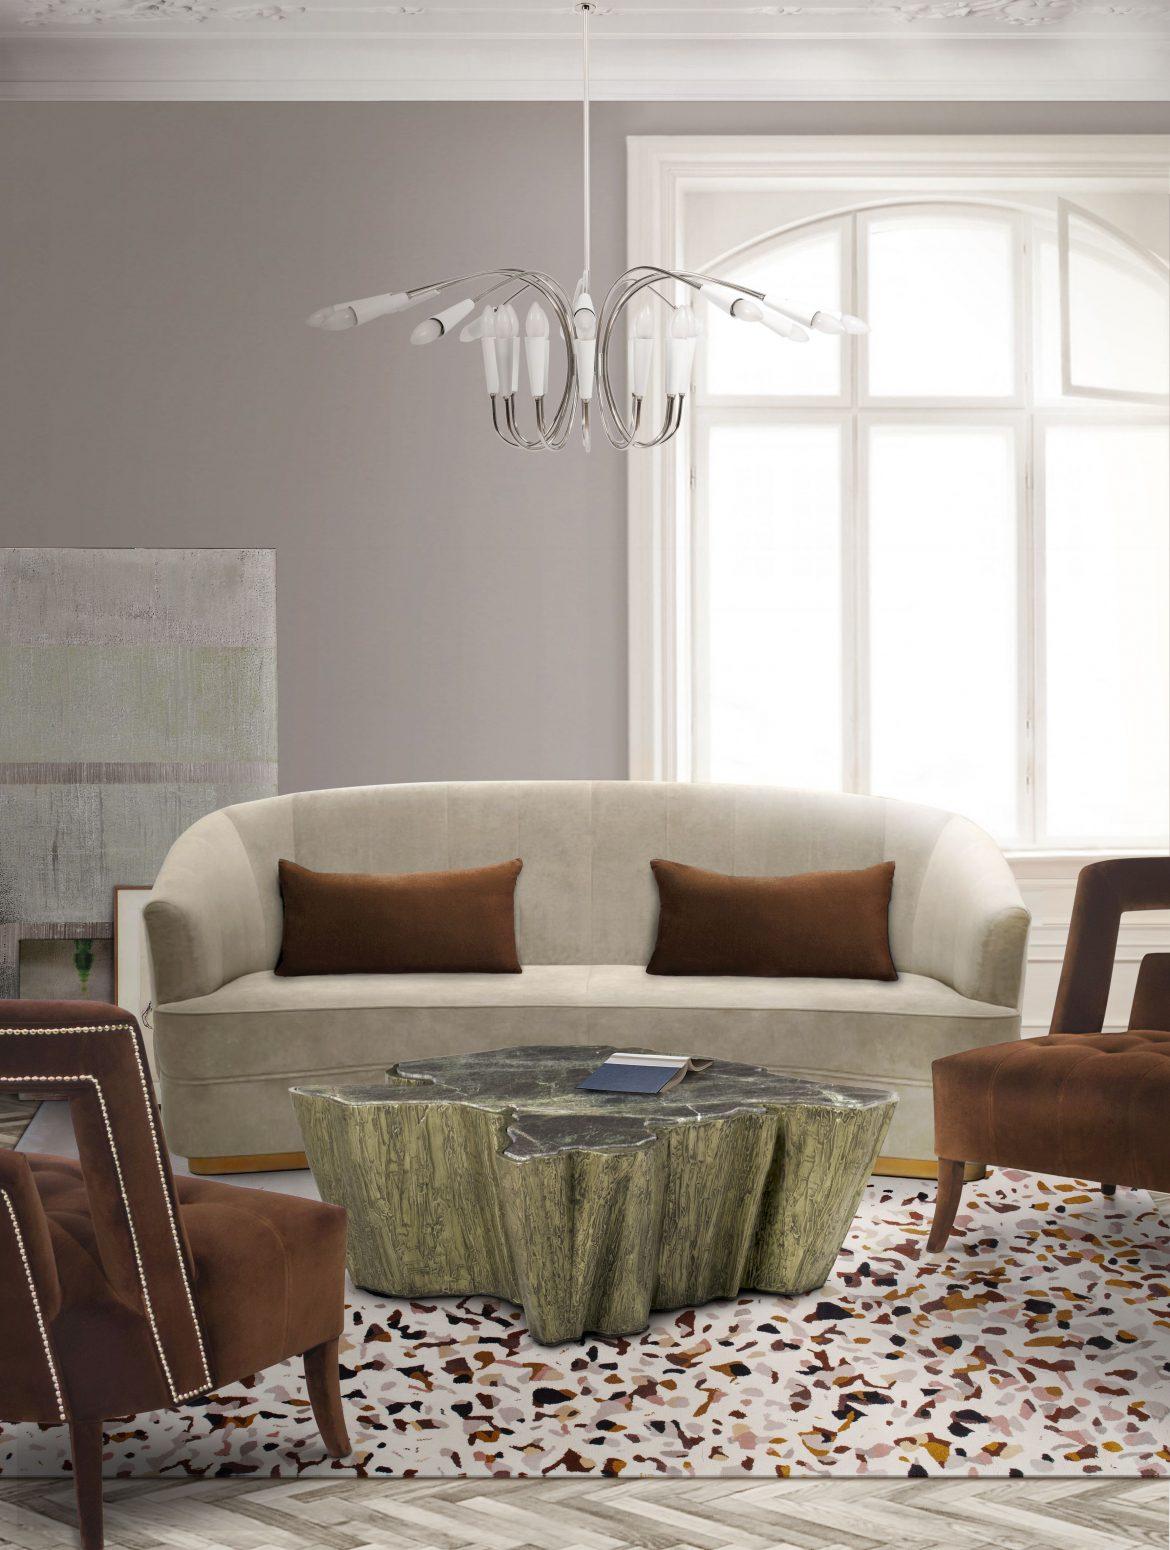 5 Modern Center Tables For Contemporary Living Rooms center tables 5 Modern Center Tables For Contemporary Living Rooms modern center tables for contemporary living rooms 1